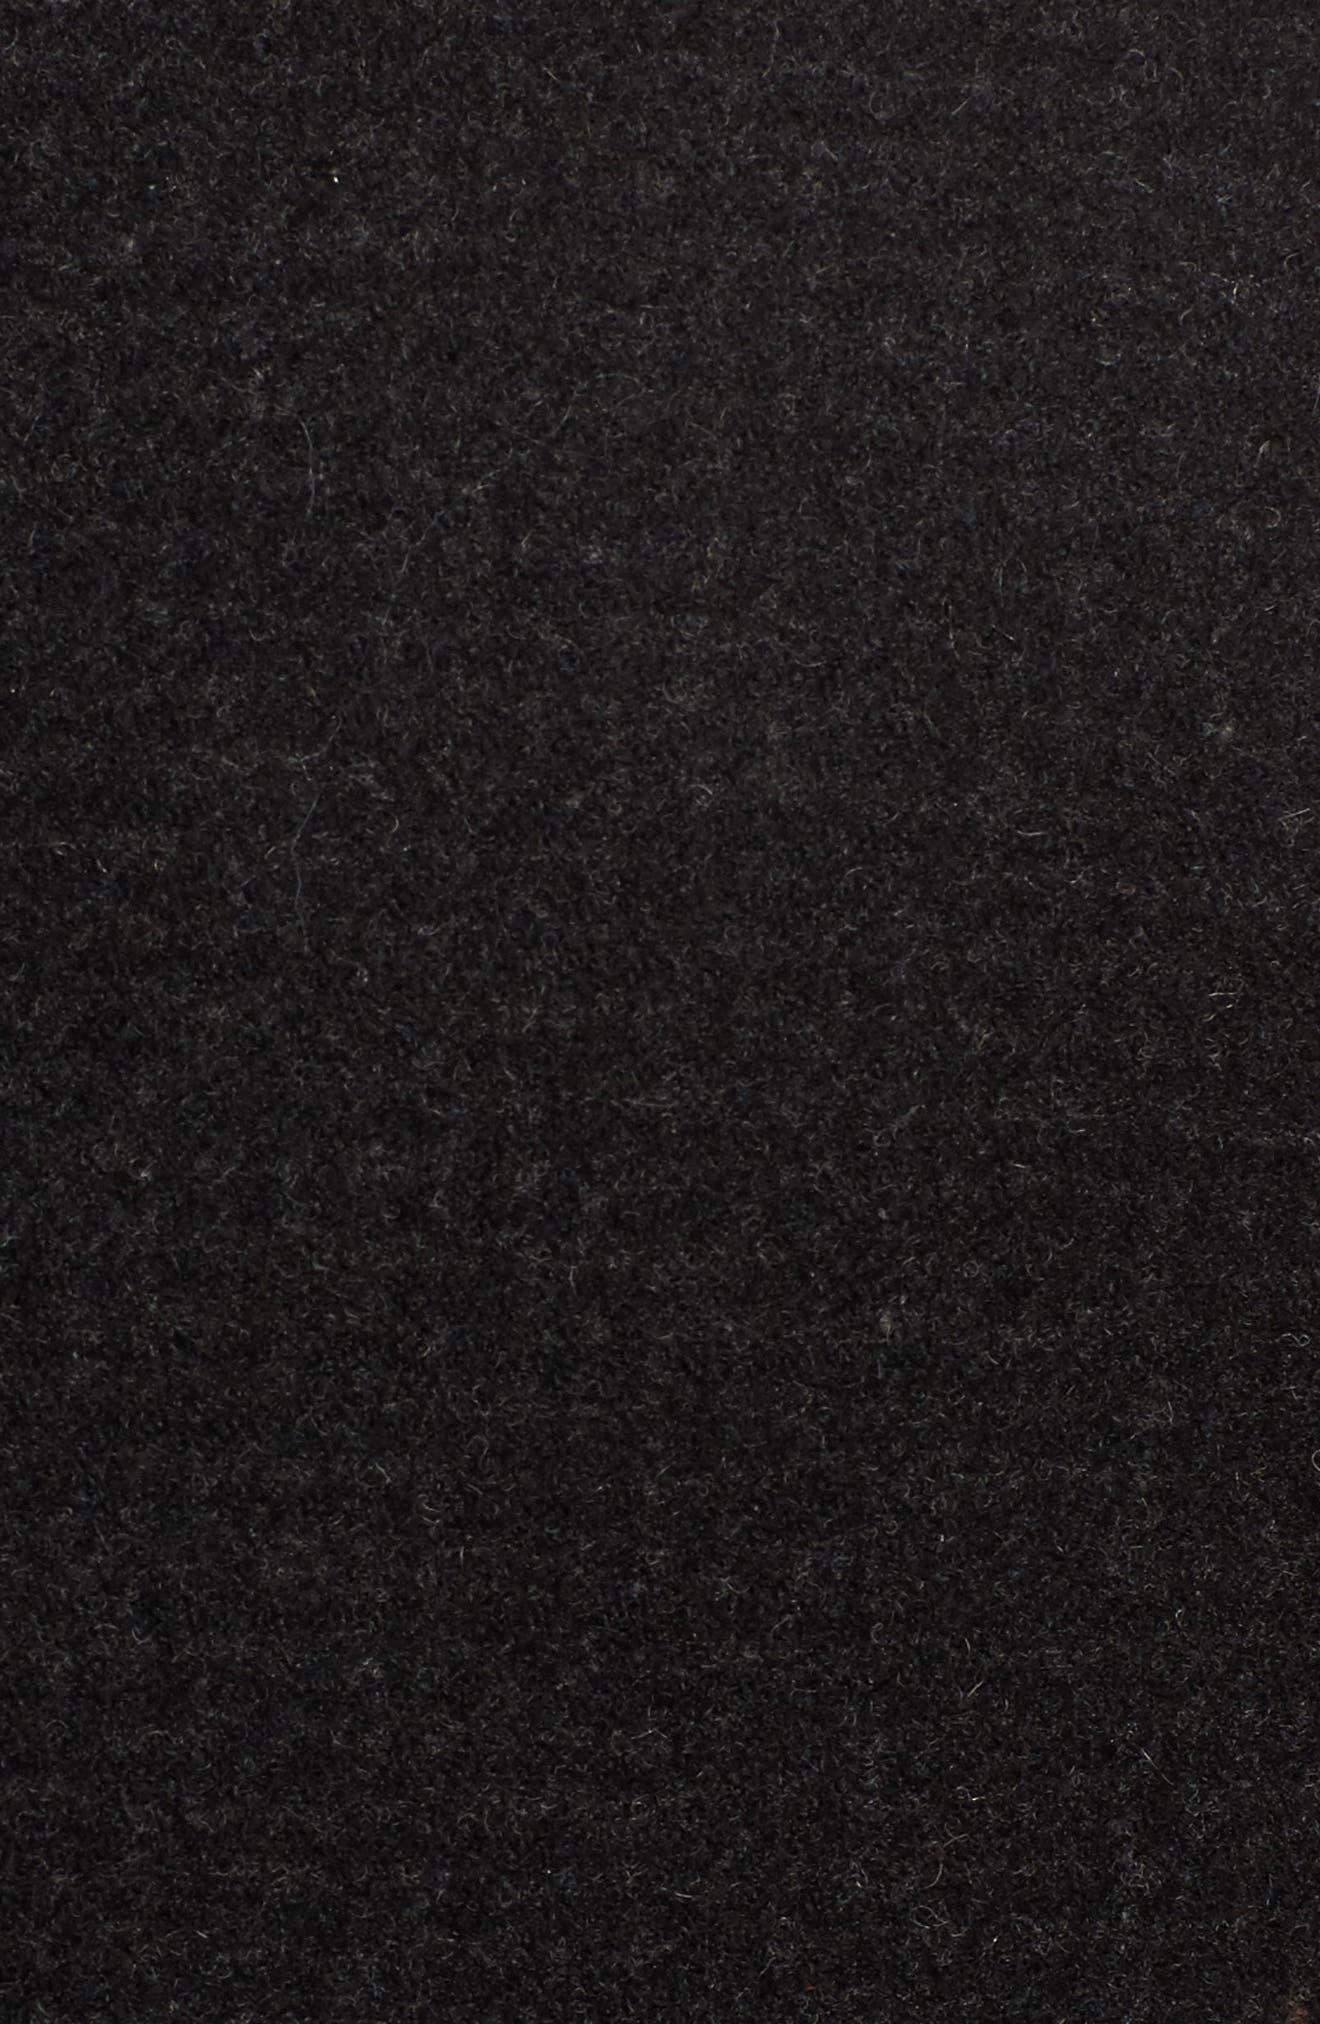 Bonded Bomber Jacket,                             Alternate thumbnail 6, color,                             010